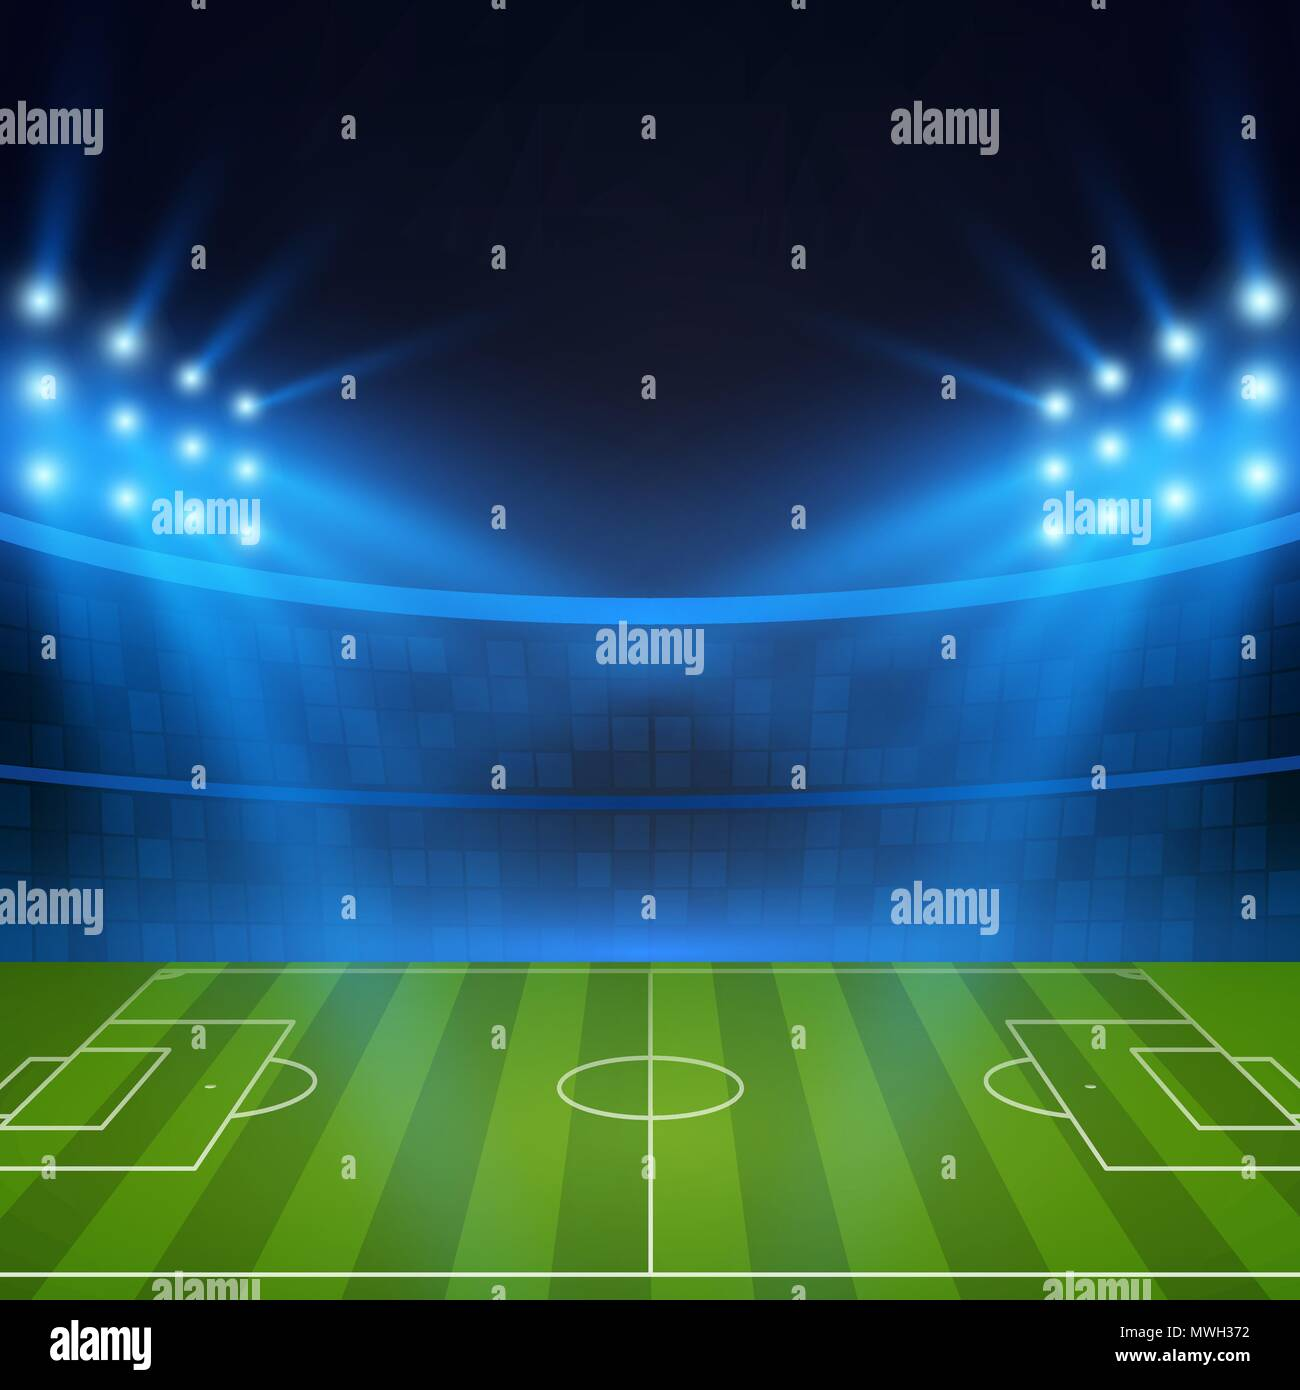 Football Stadium. Soccer field in the light of searchlights. Football World Cup. Vector illustration - Stock Vector